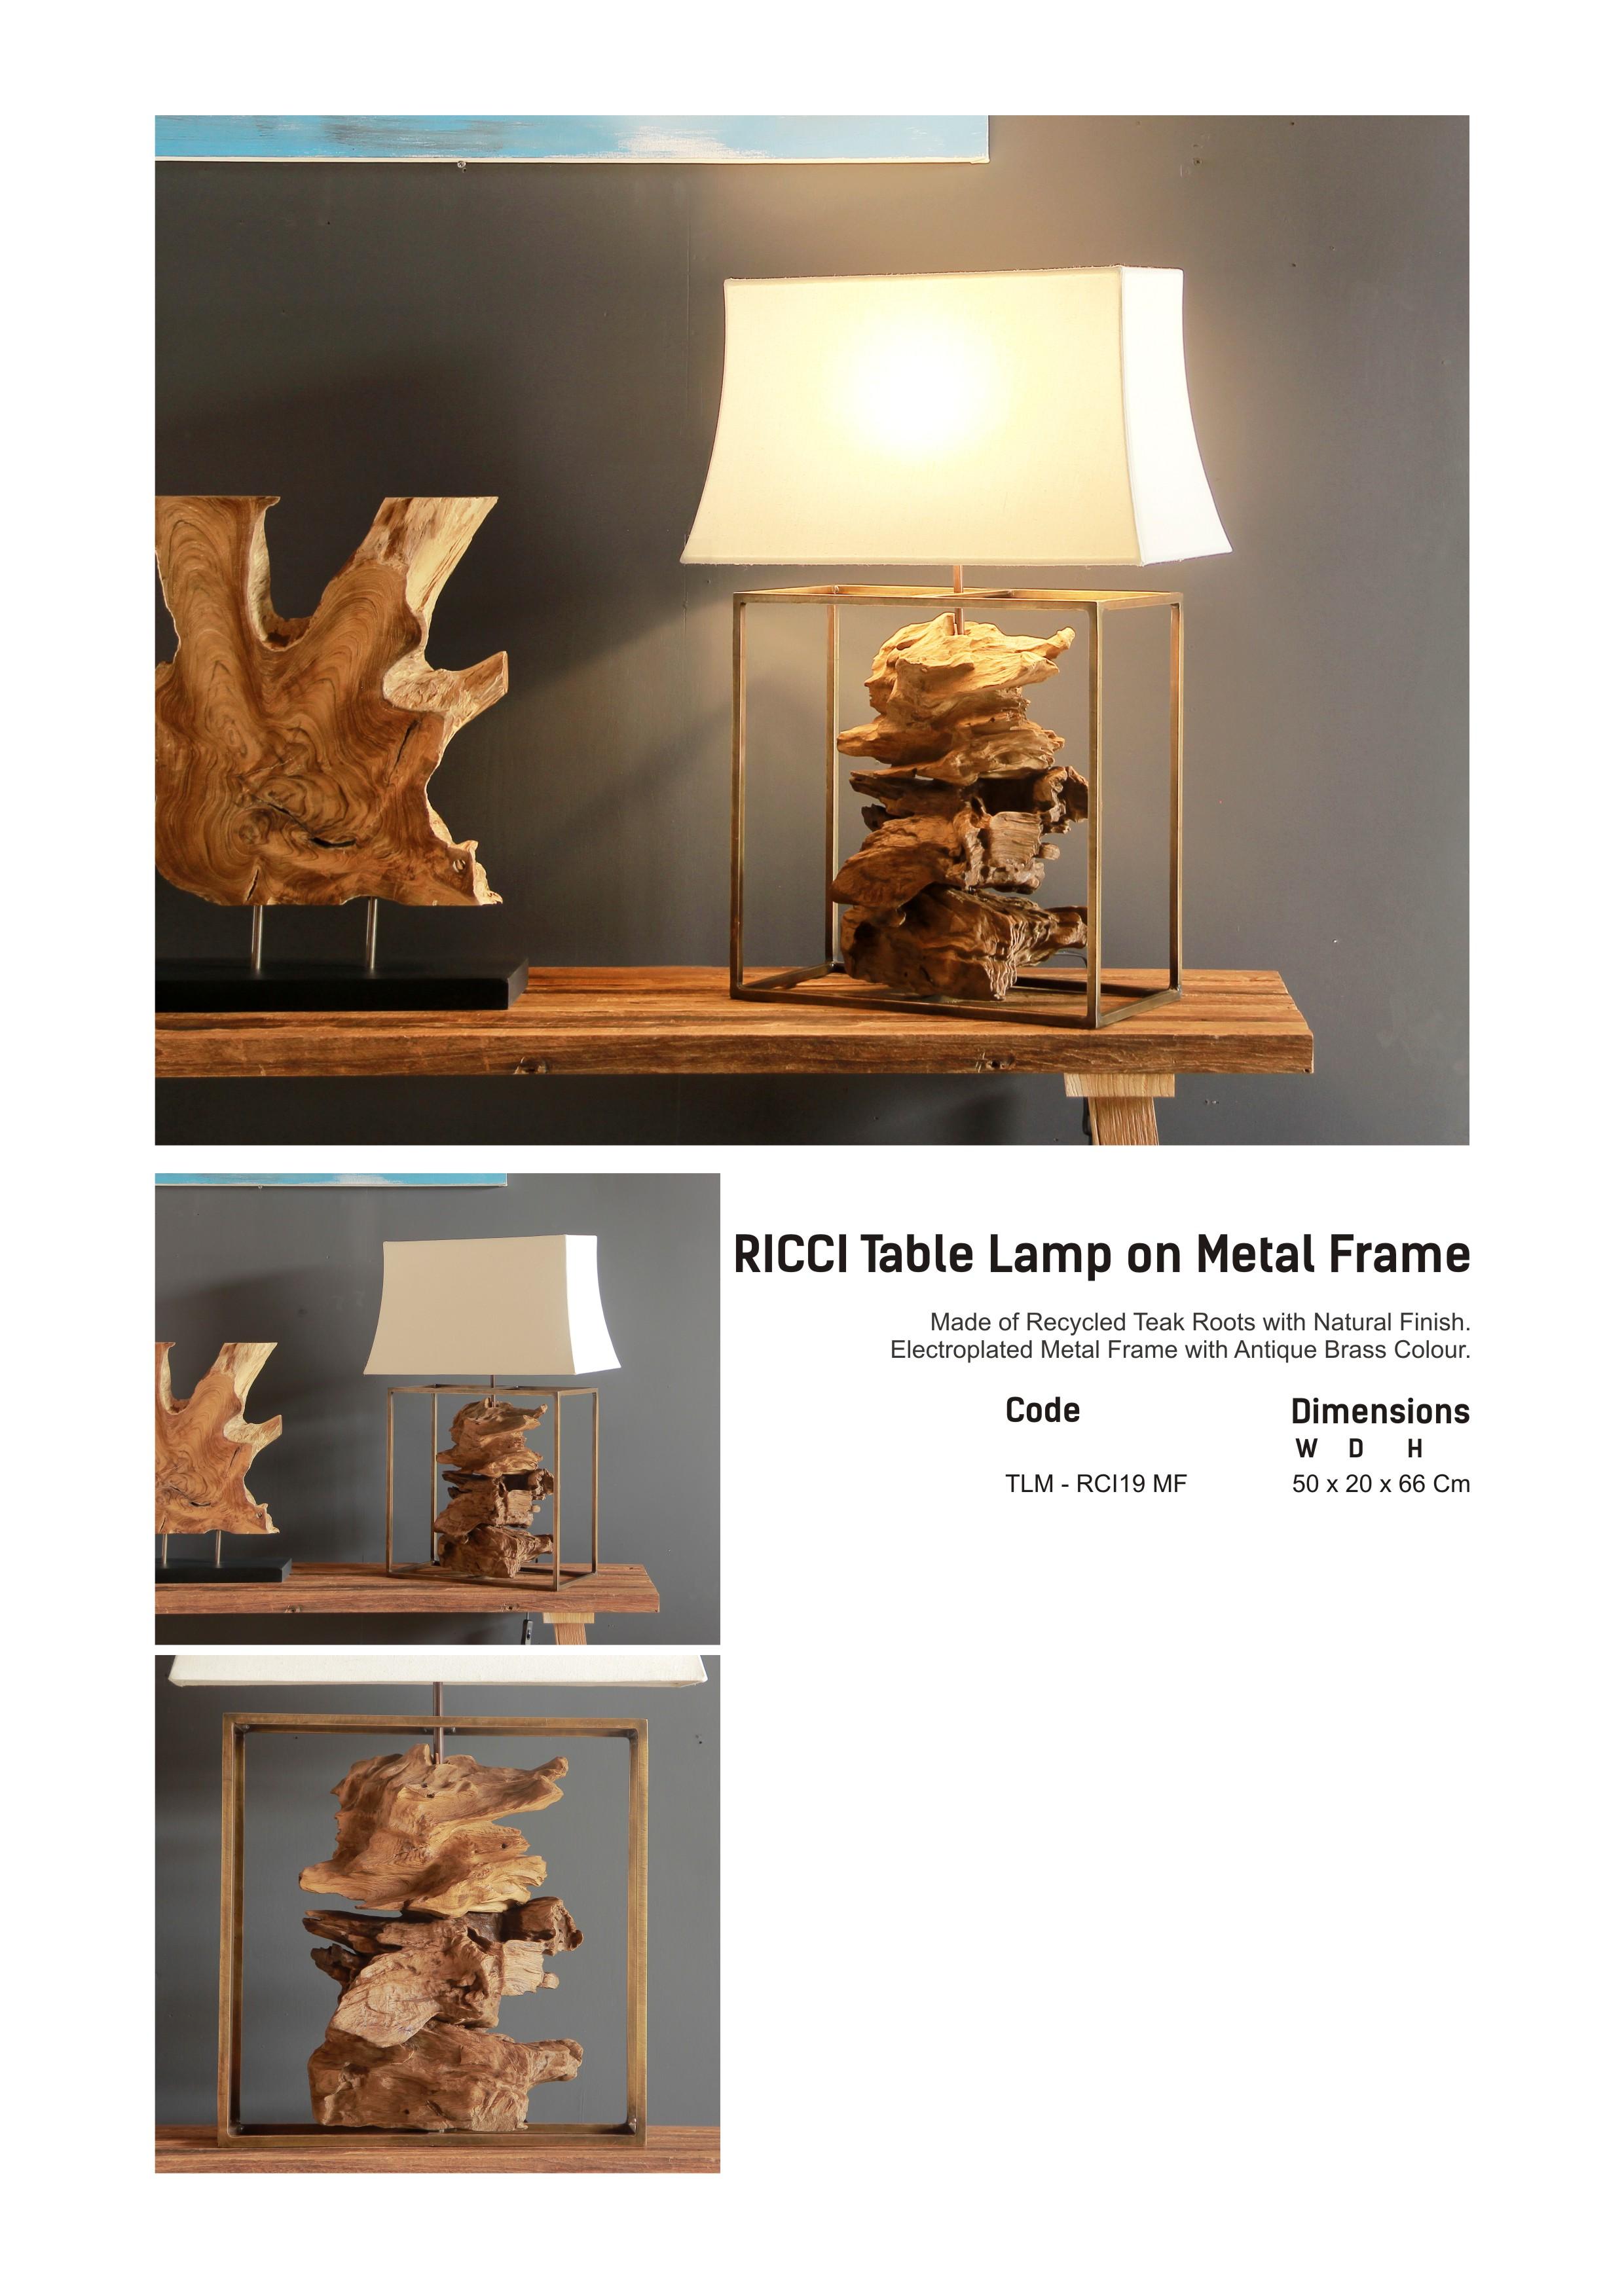 19. RICCI Table Lamp2